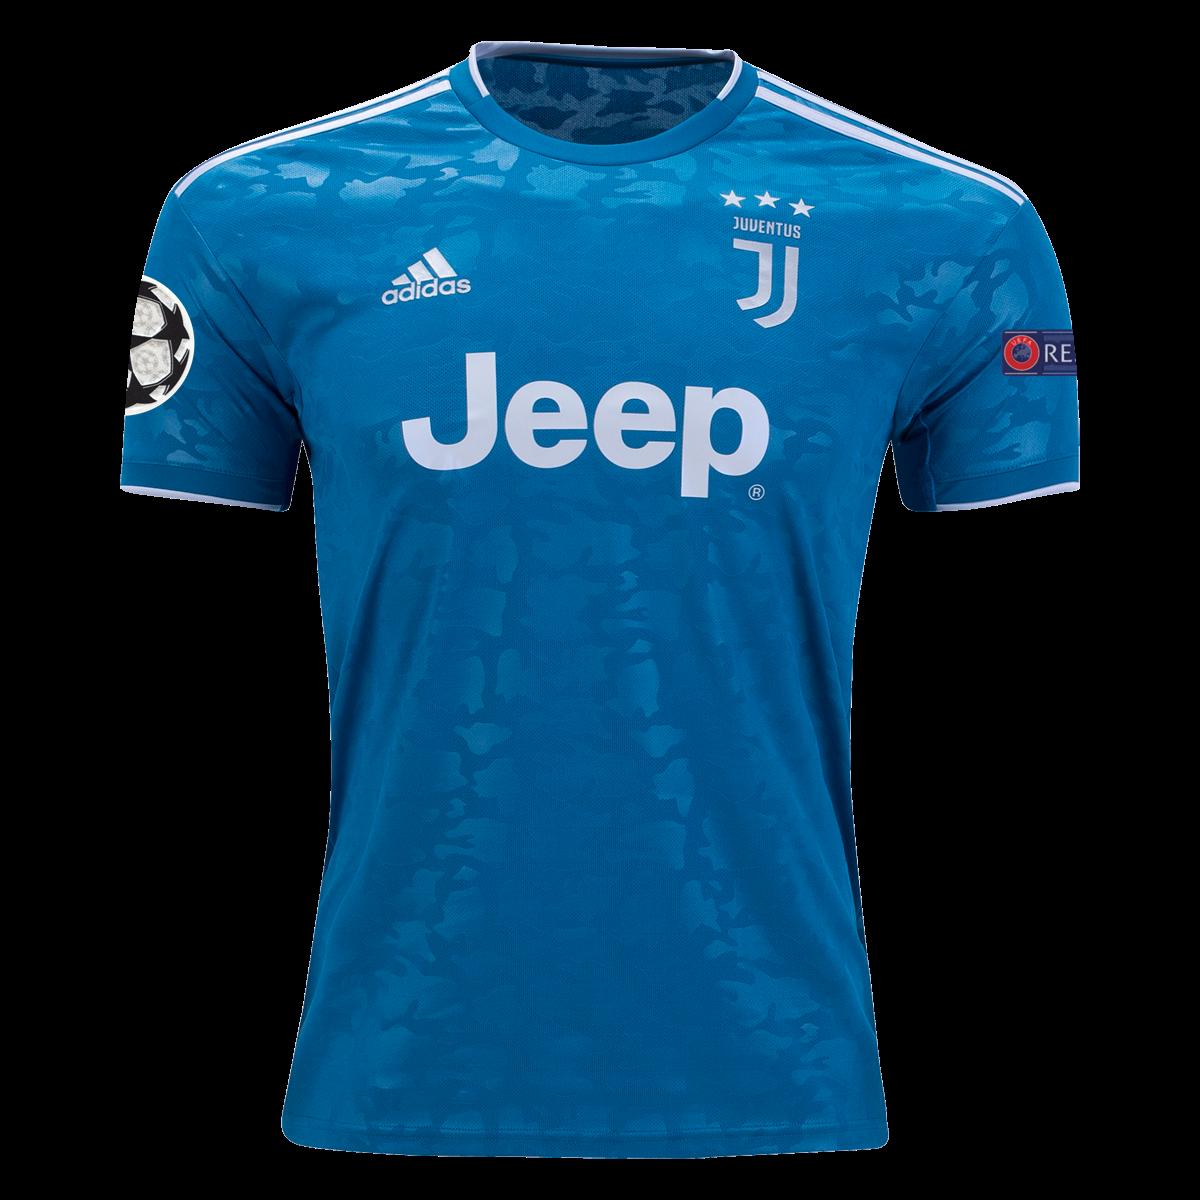 Adidas Juventus Third Ucl Jersey 19 20 M Jersey Shirt World